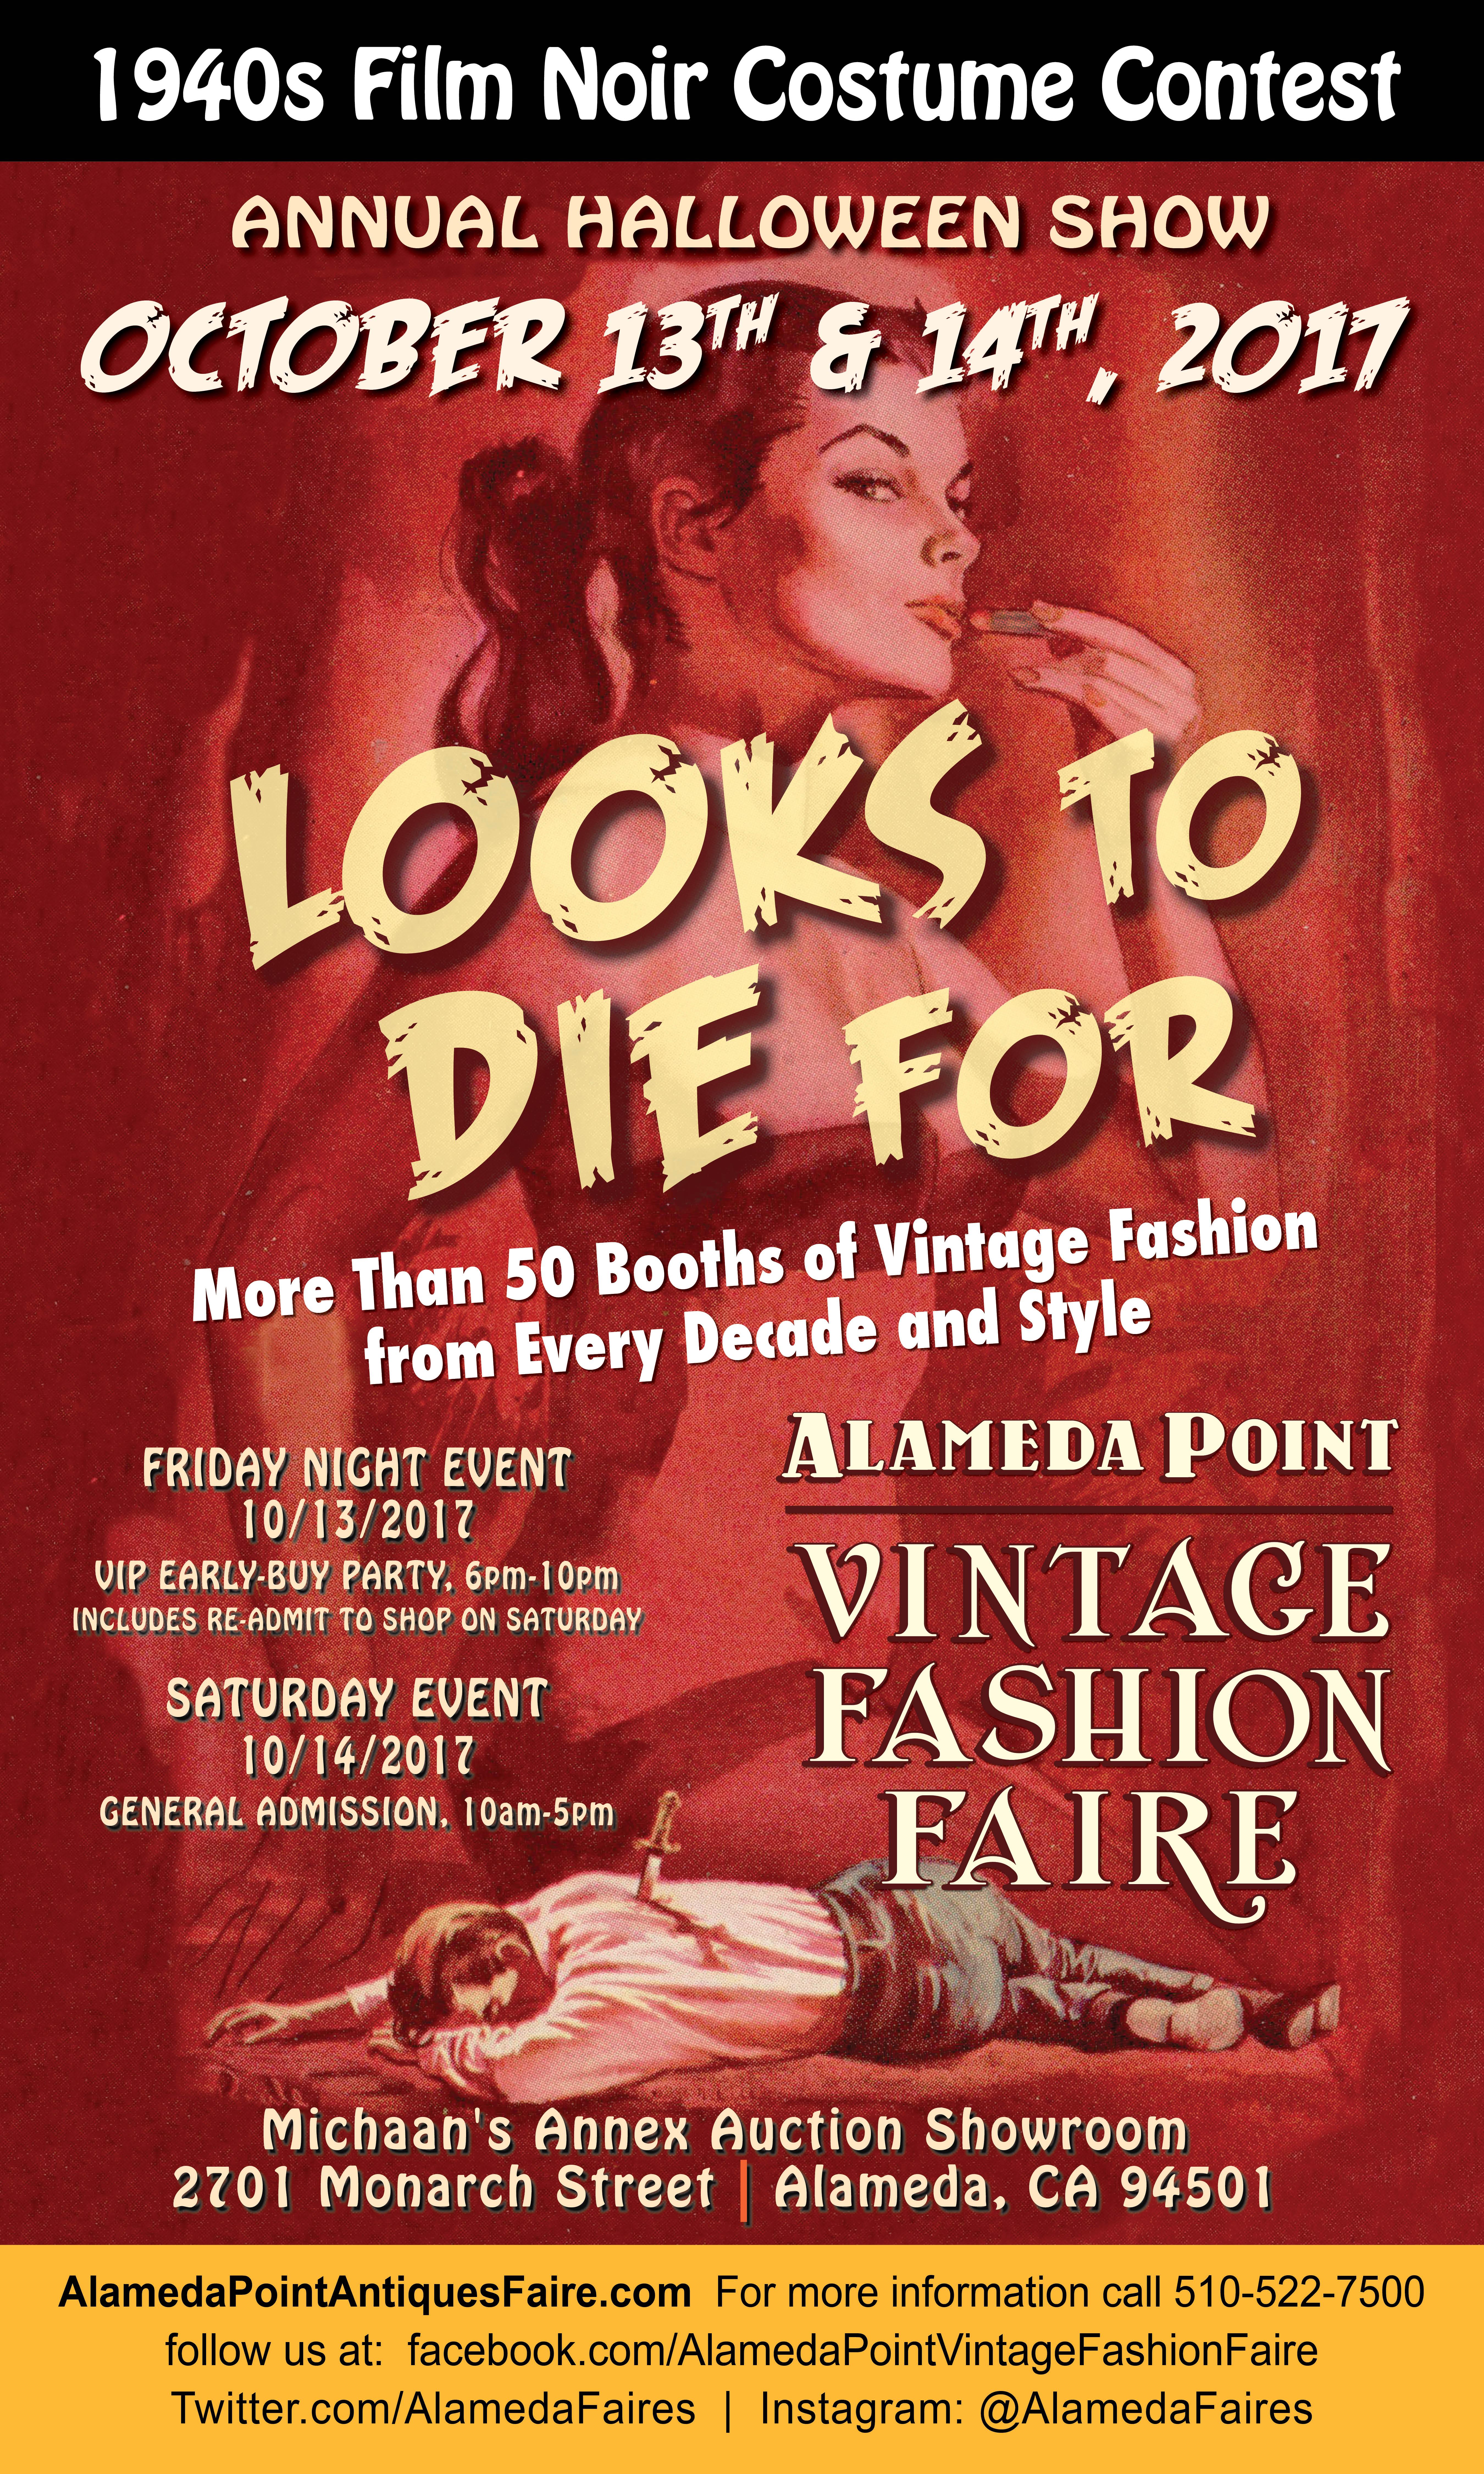 Alameda point vintage fashion fair 85